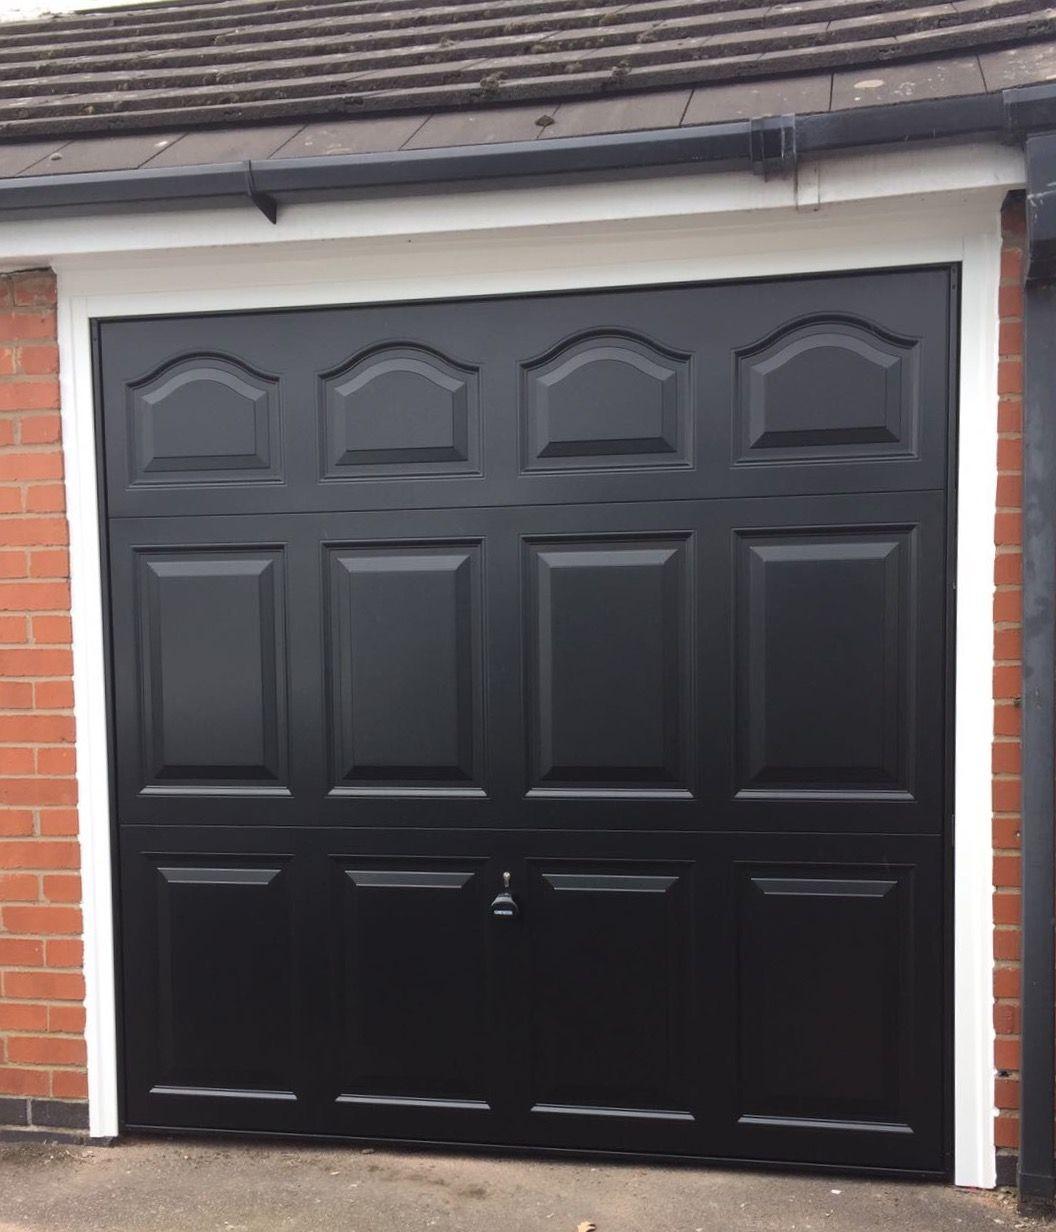 Garador Cathedral Jet Black Ral 9005 Sectional Garage Doors Garage Doors Garage Door Insulation